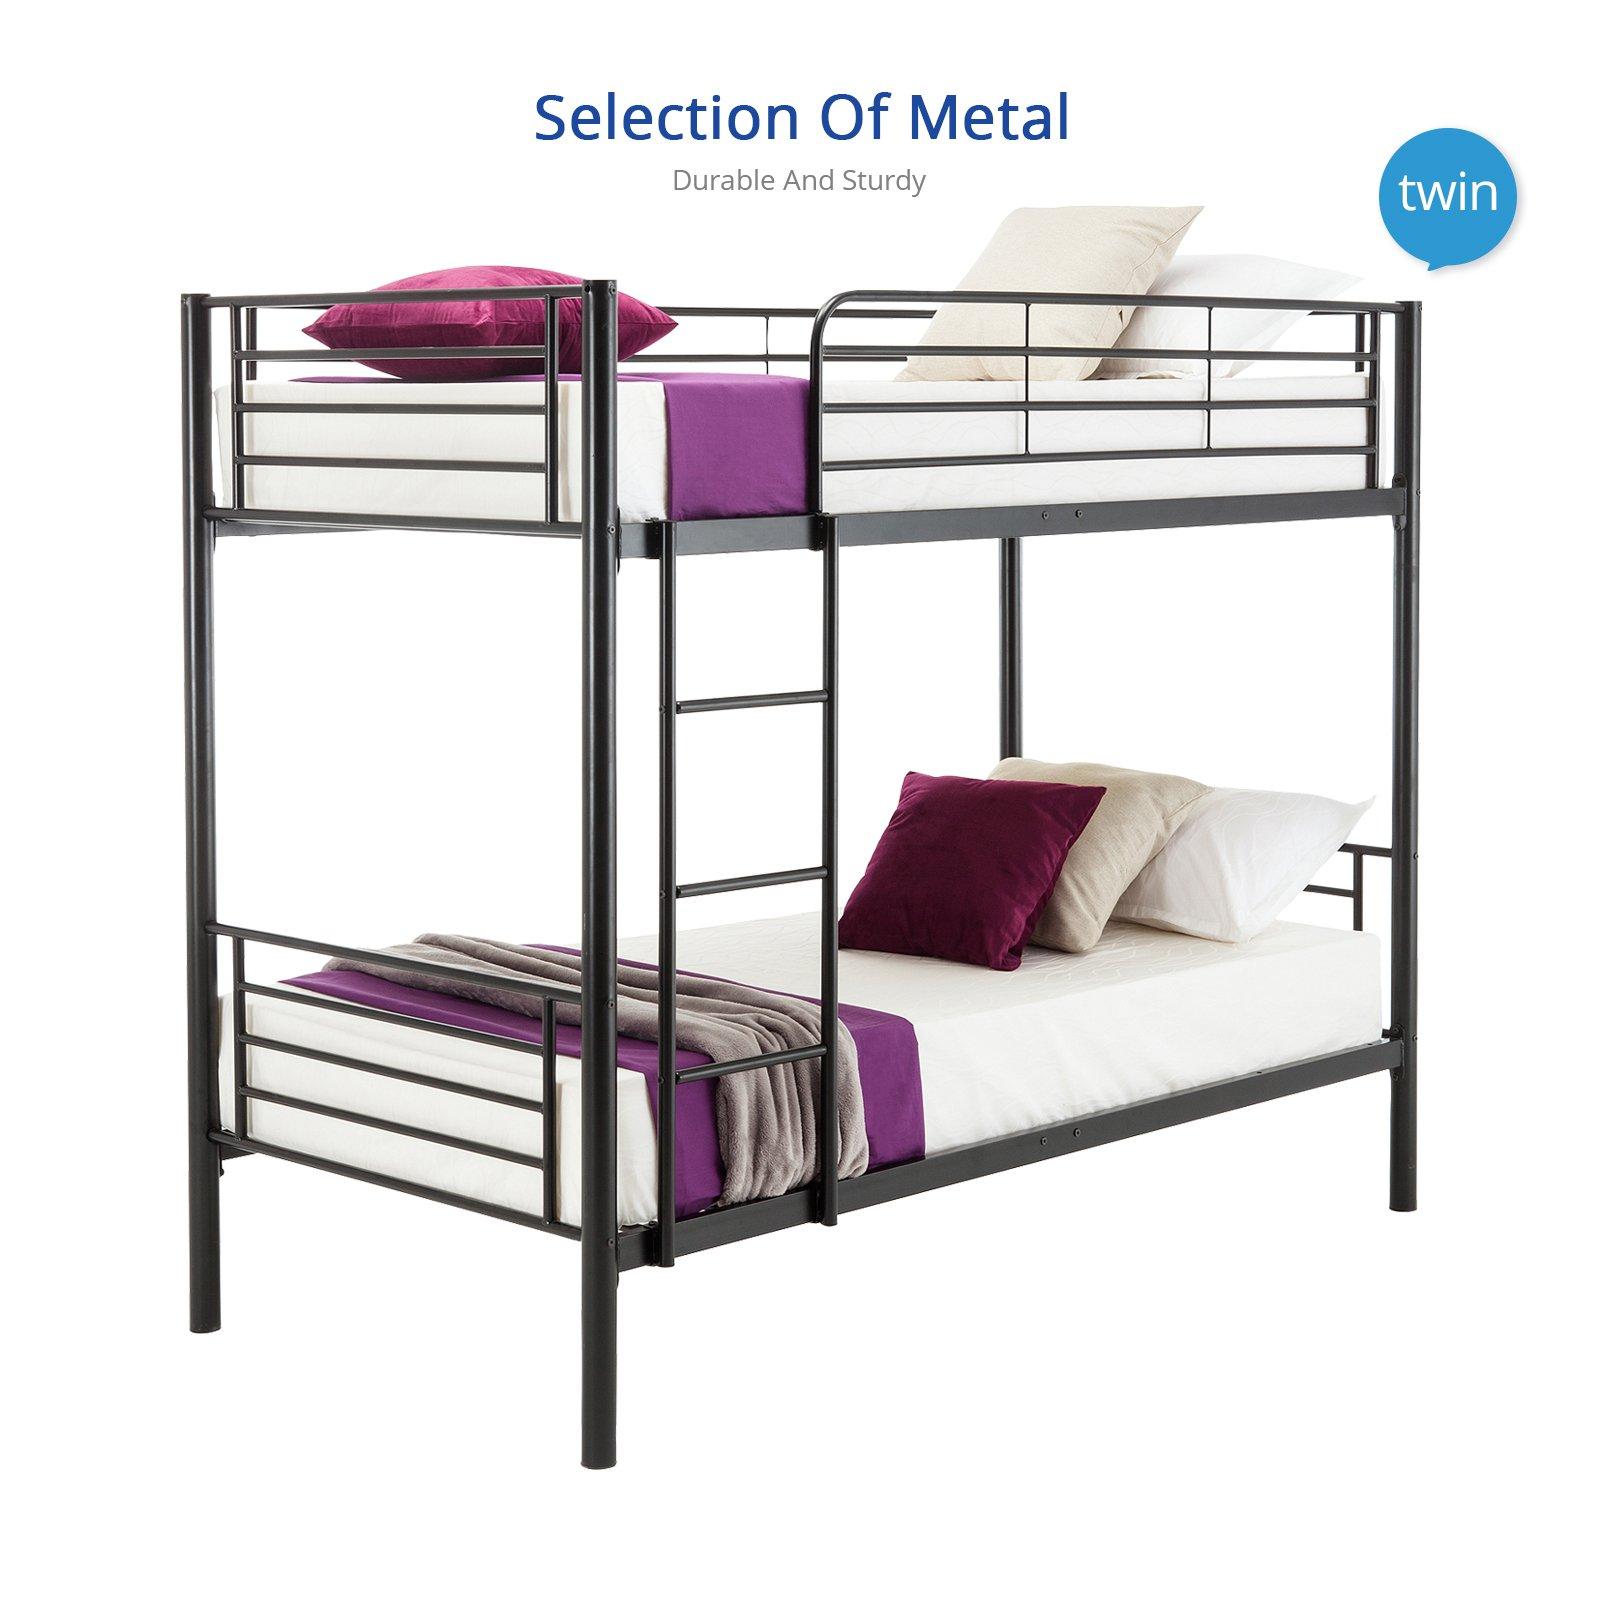 Mecor Twin over Twin Metal Bunk Beds Frame Kids /Adult Children Bedroom Furniture with Ladder,Black